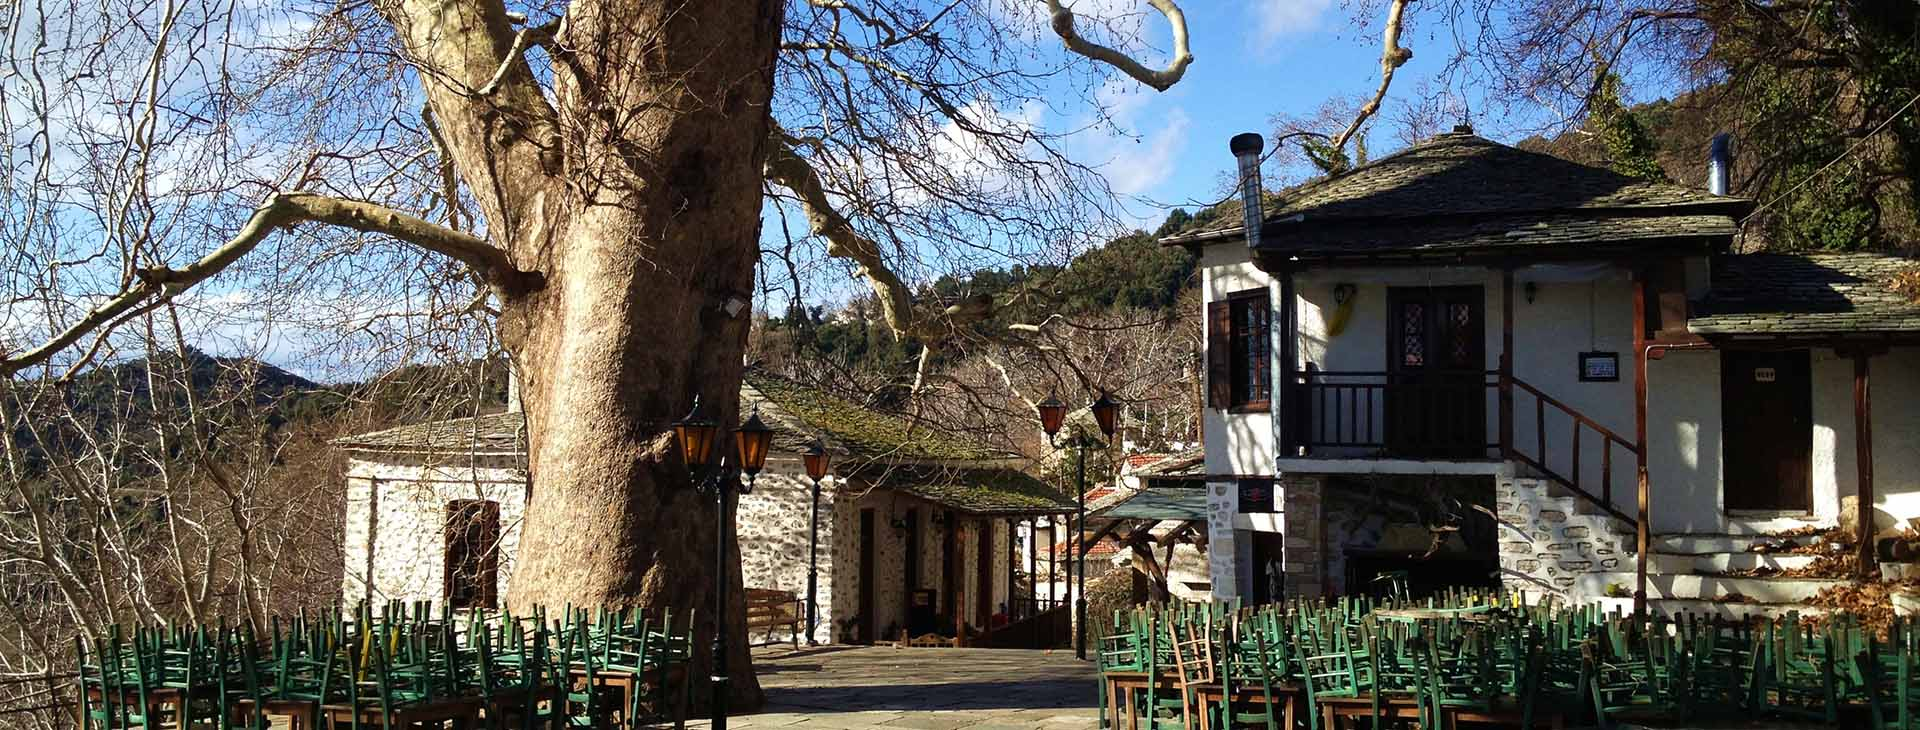 Vizitsa village, Mt. Pilio, Magnisia